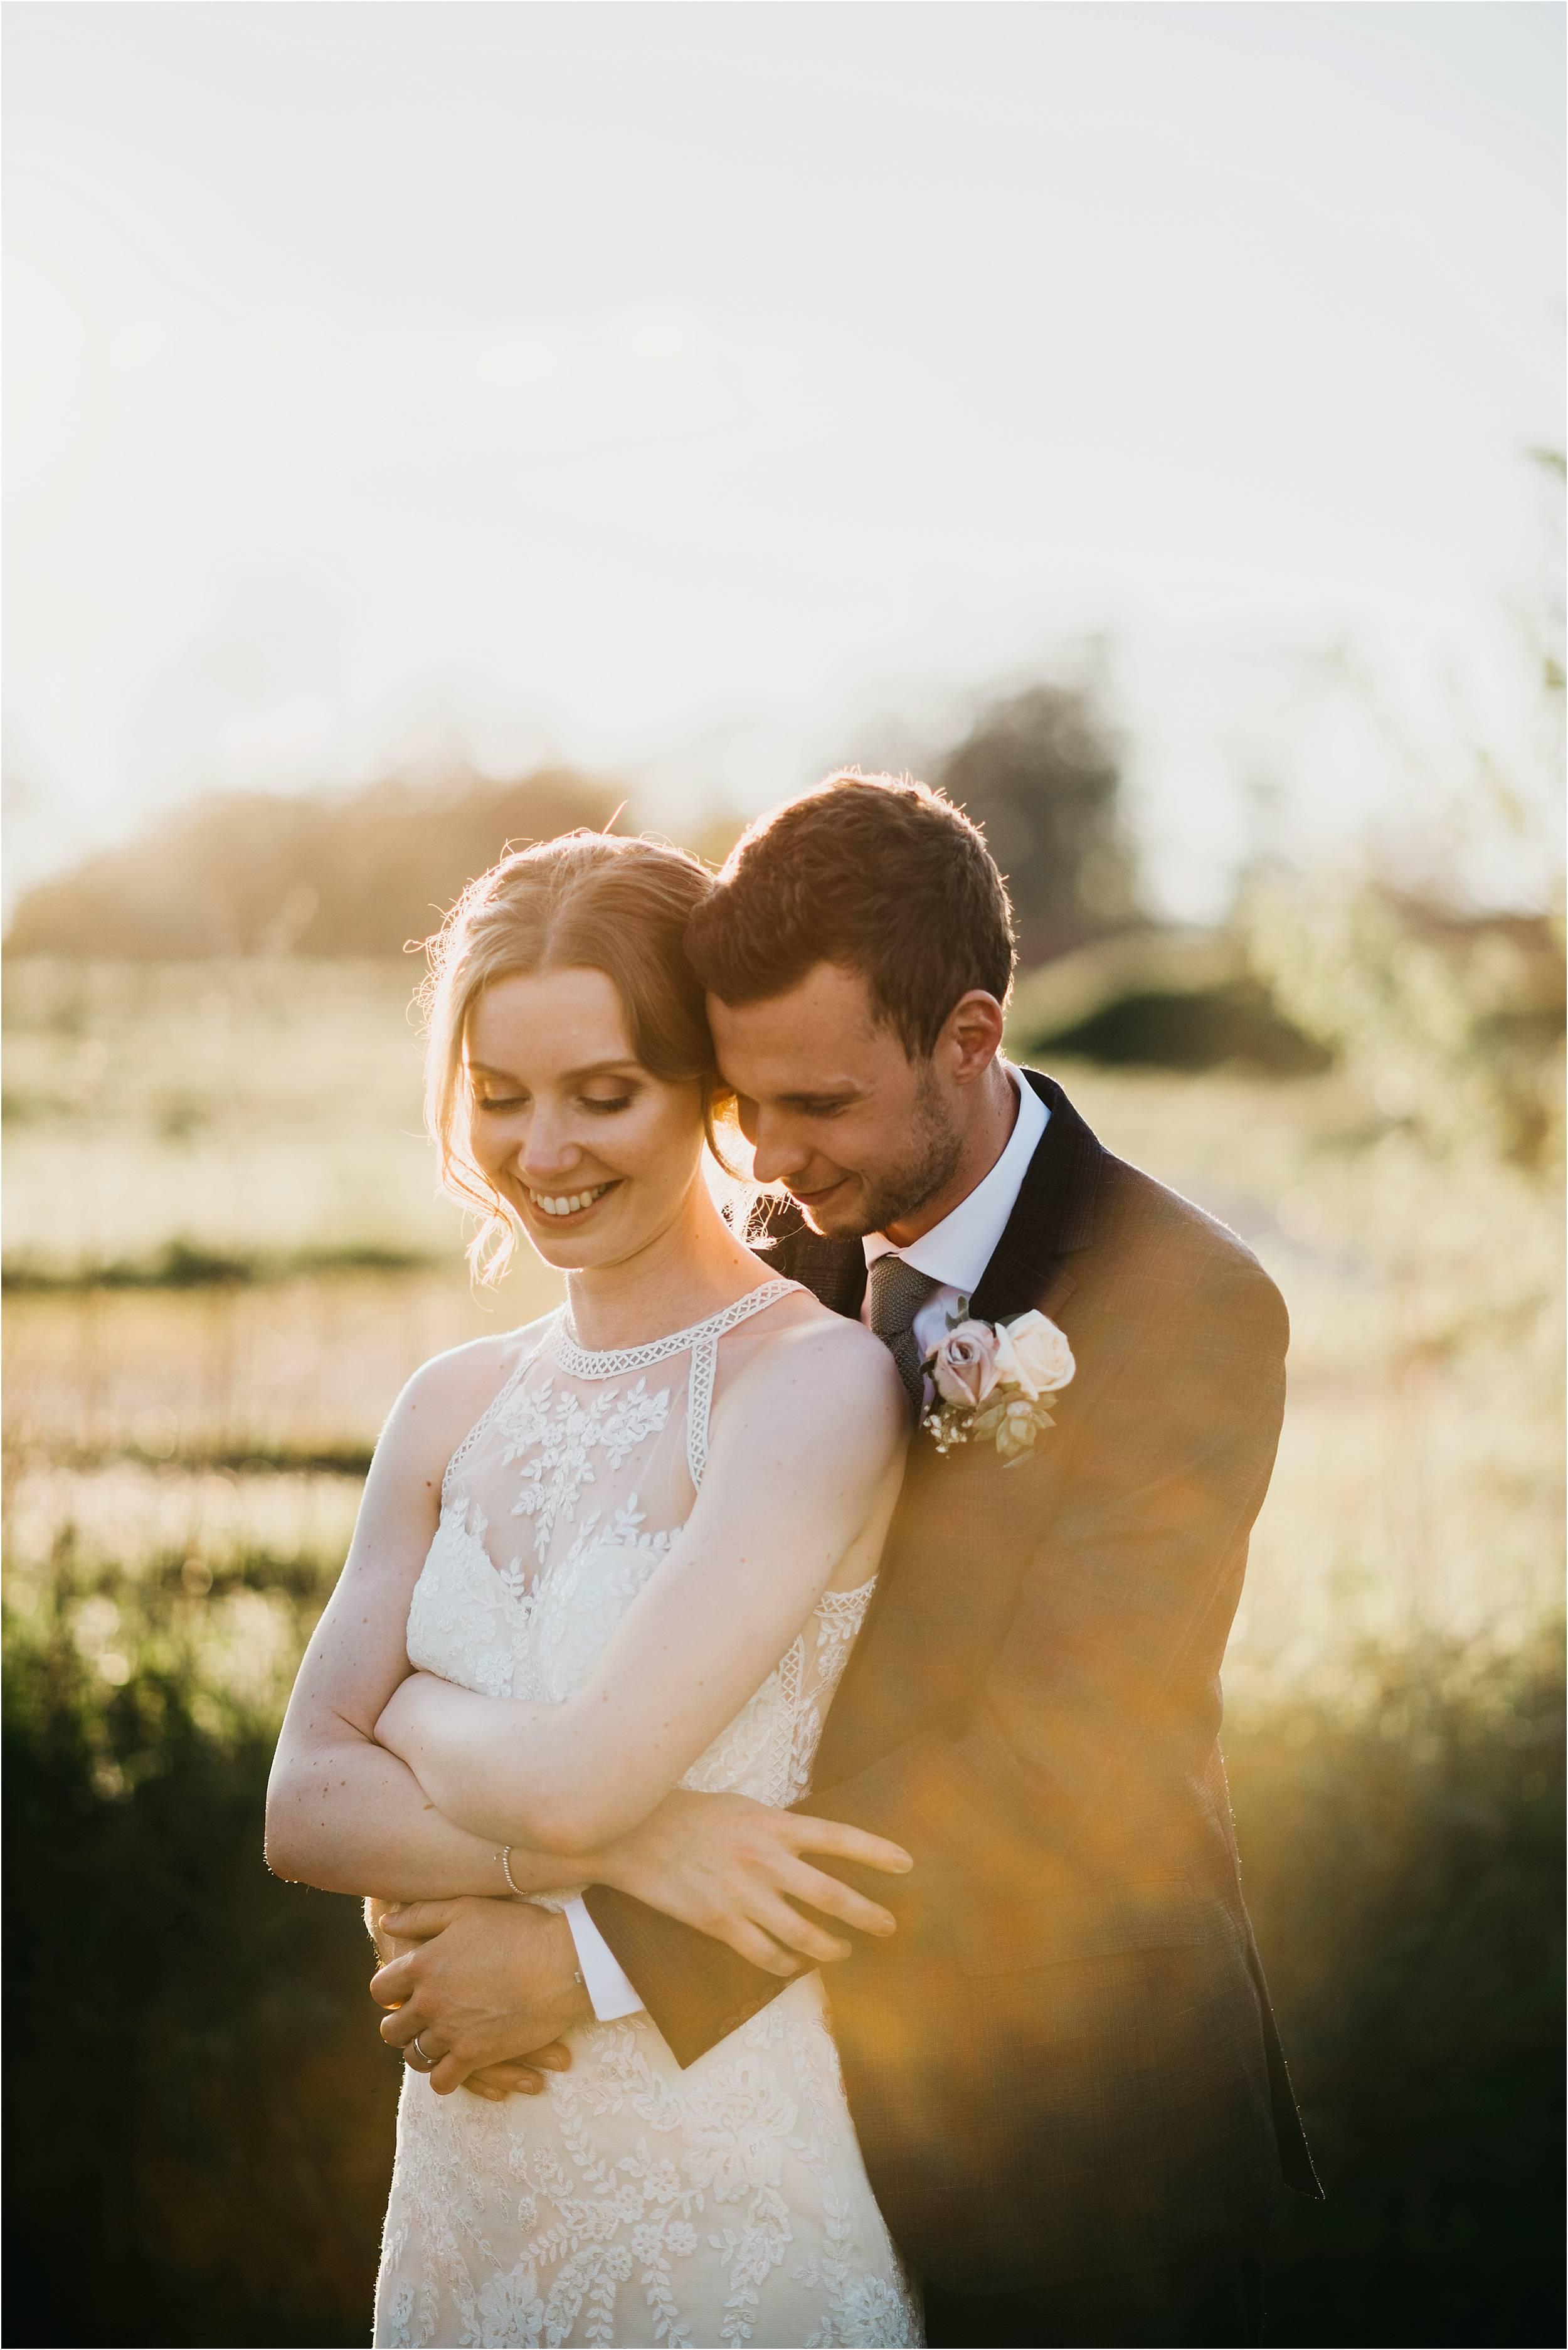 Kedleston Country House Wedding Photography_0091.jpg